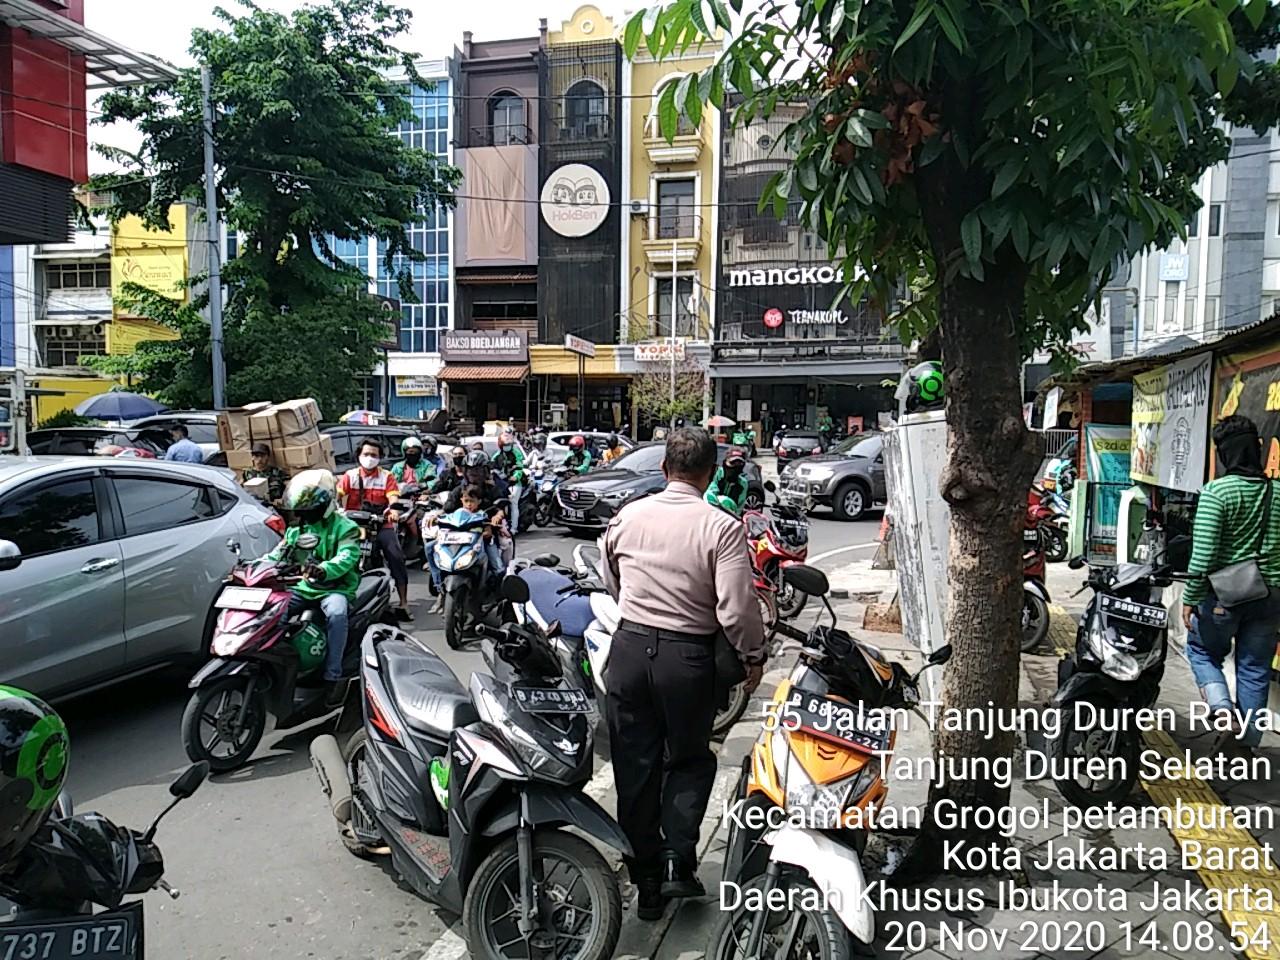 Edukasi Warga Pentingnya Prokes, Polsek Tanjung Duren Gelar Patroli Aman Nusa II